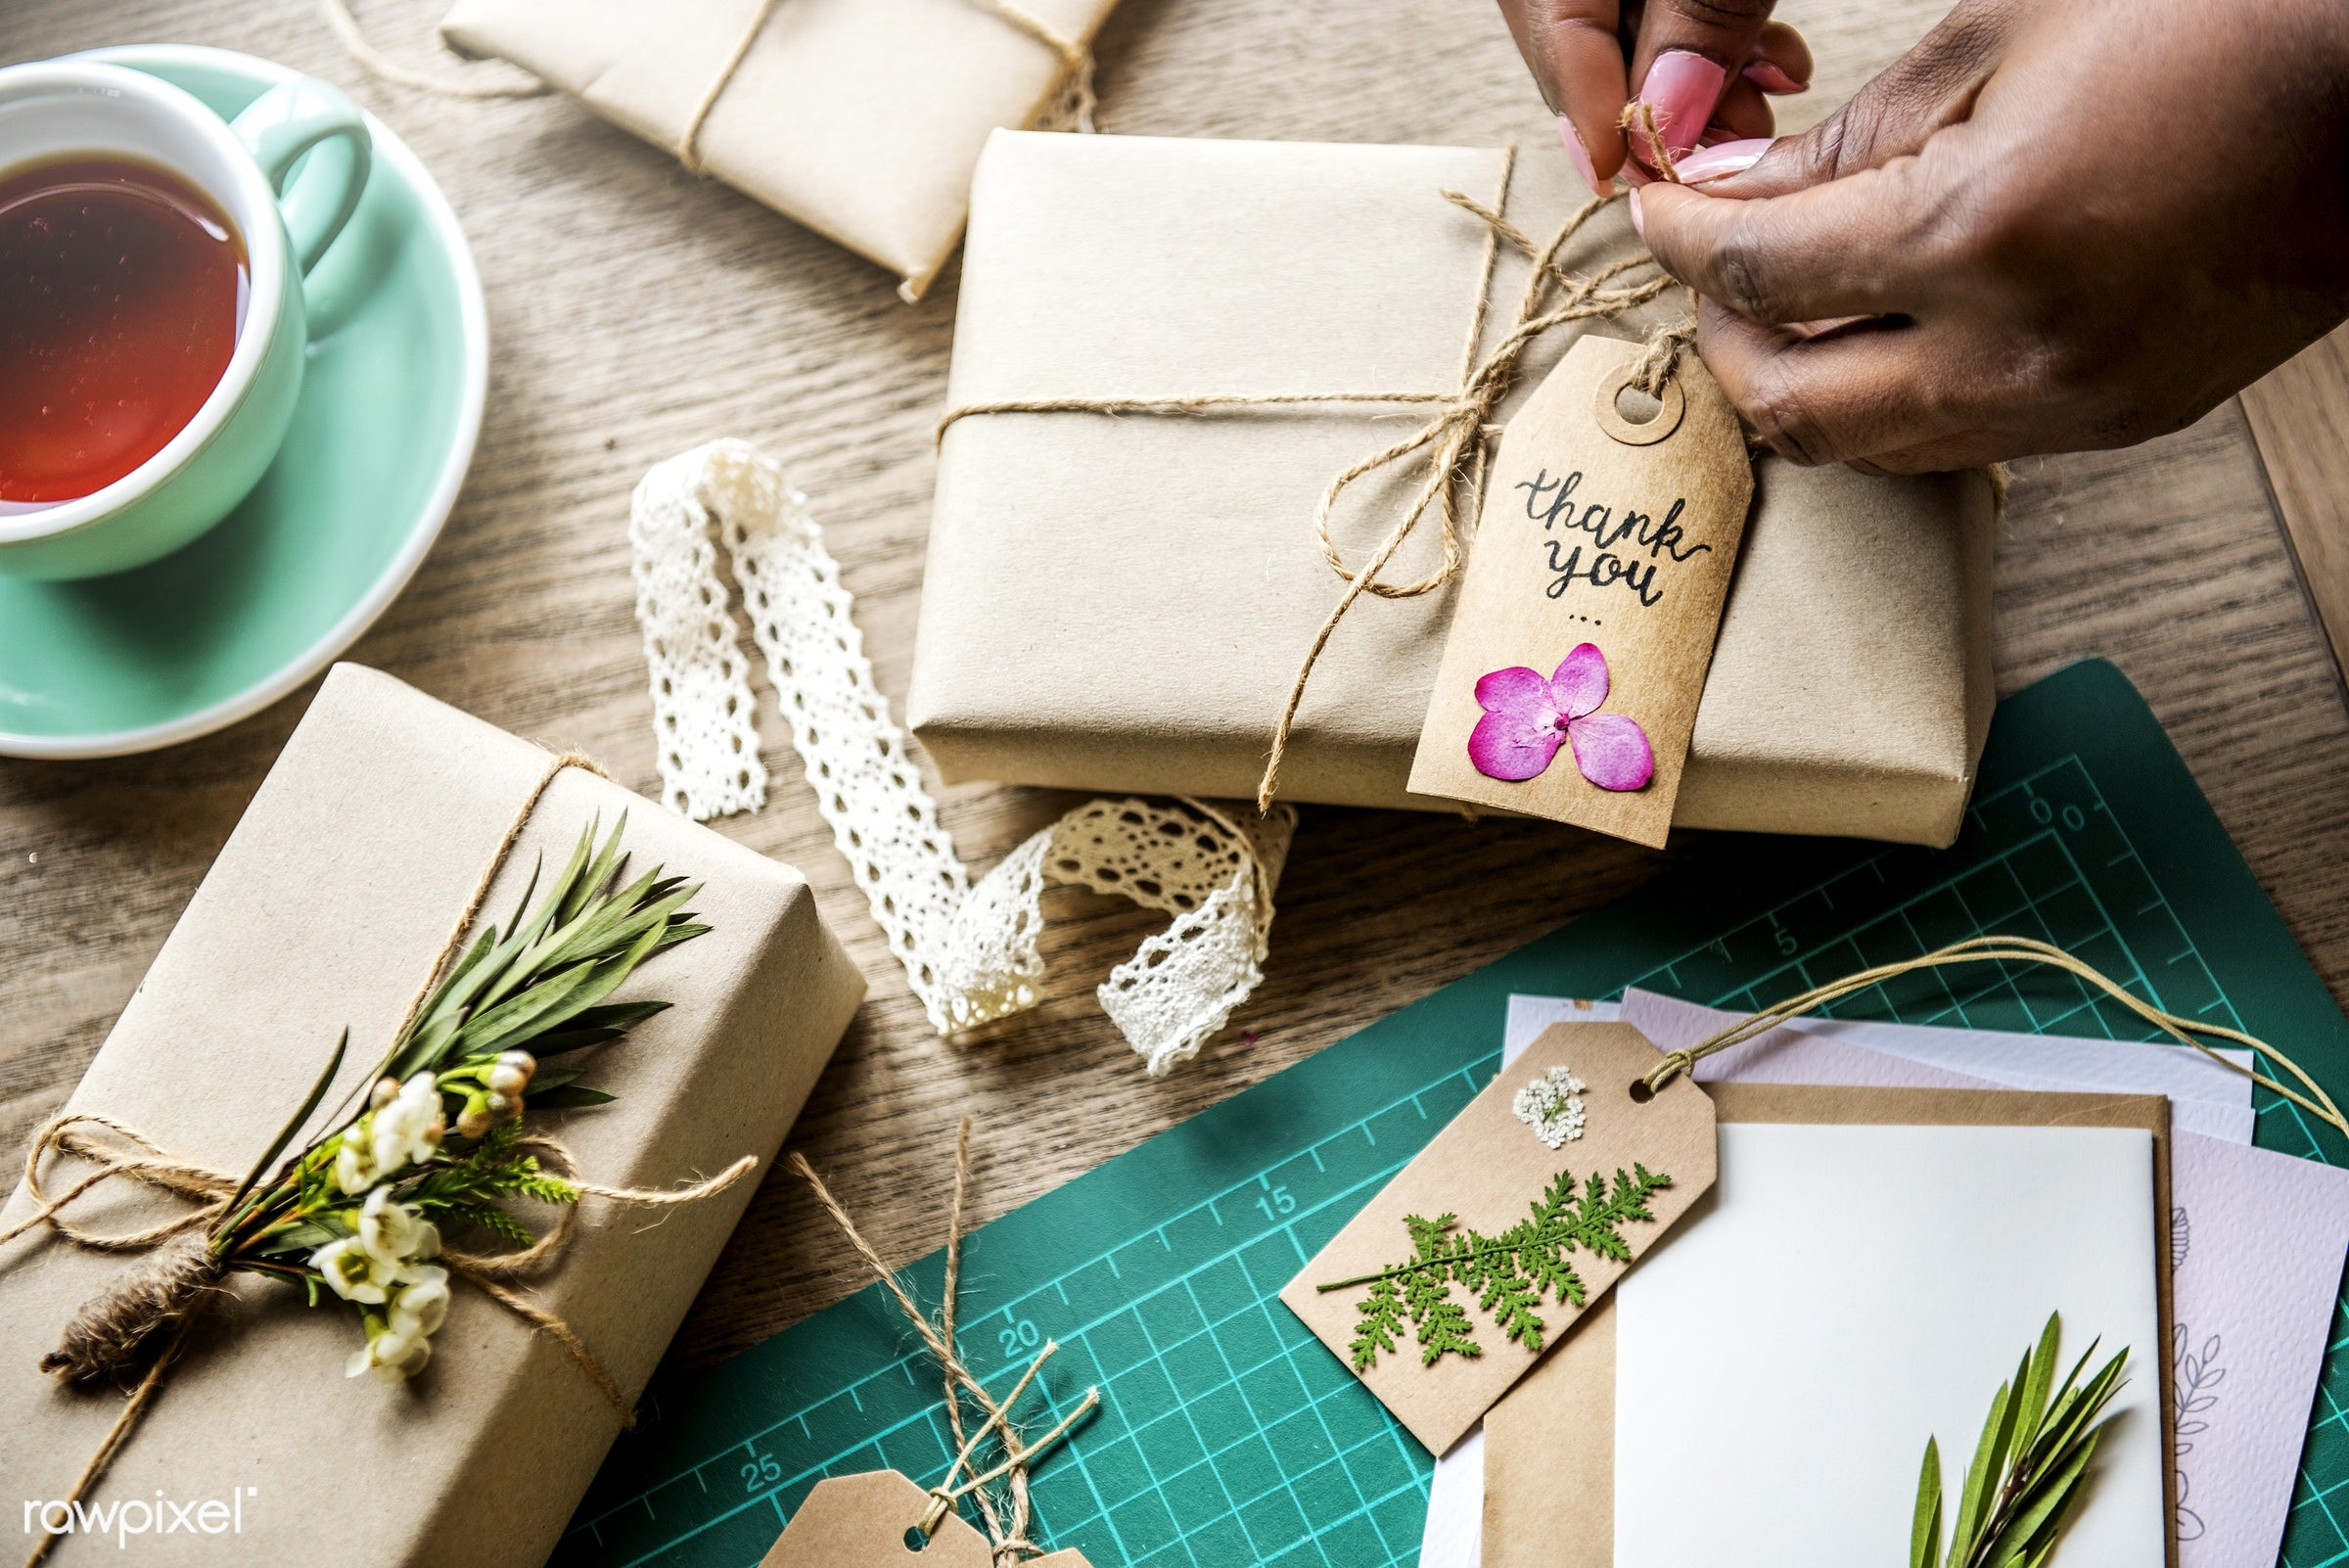 aerial, art, artsy, birthday, bow, box, card, closeup, craft, creative, decor, decoration, design, desk, dry flower, figures...